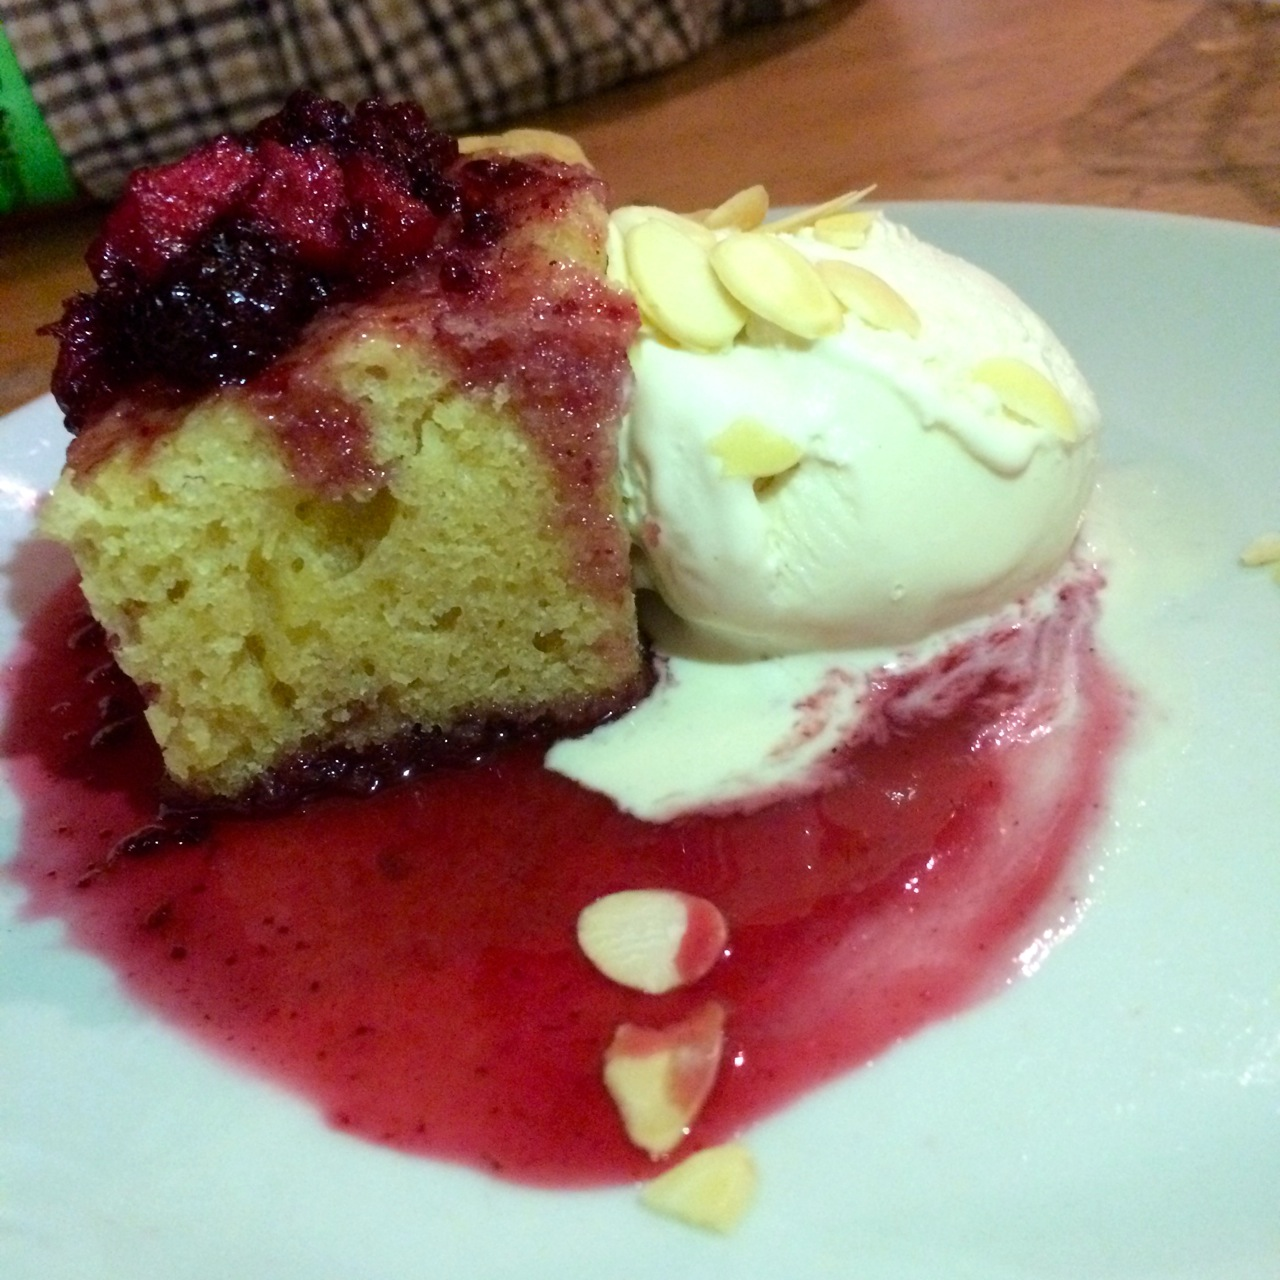 http://fatgayvegan.com/wp-content/uploads/2015/12/Bakewell-cake-with-vegan-ice-cream.jpg